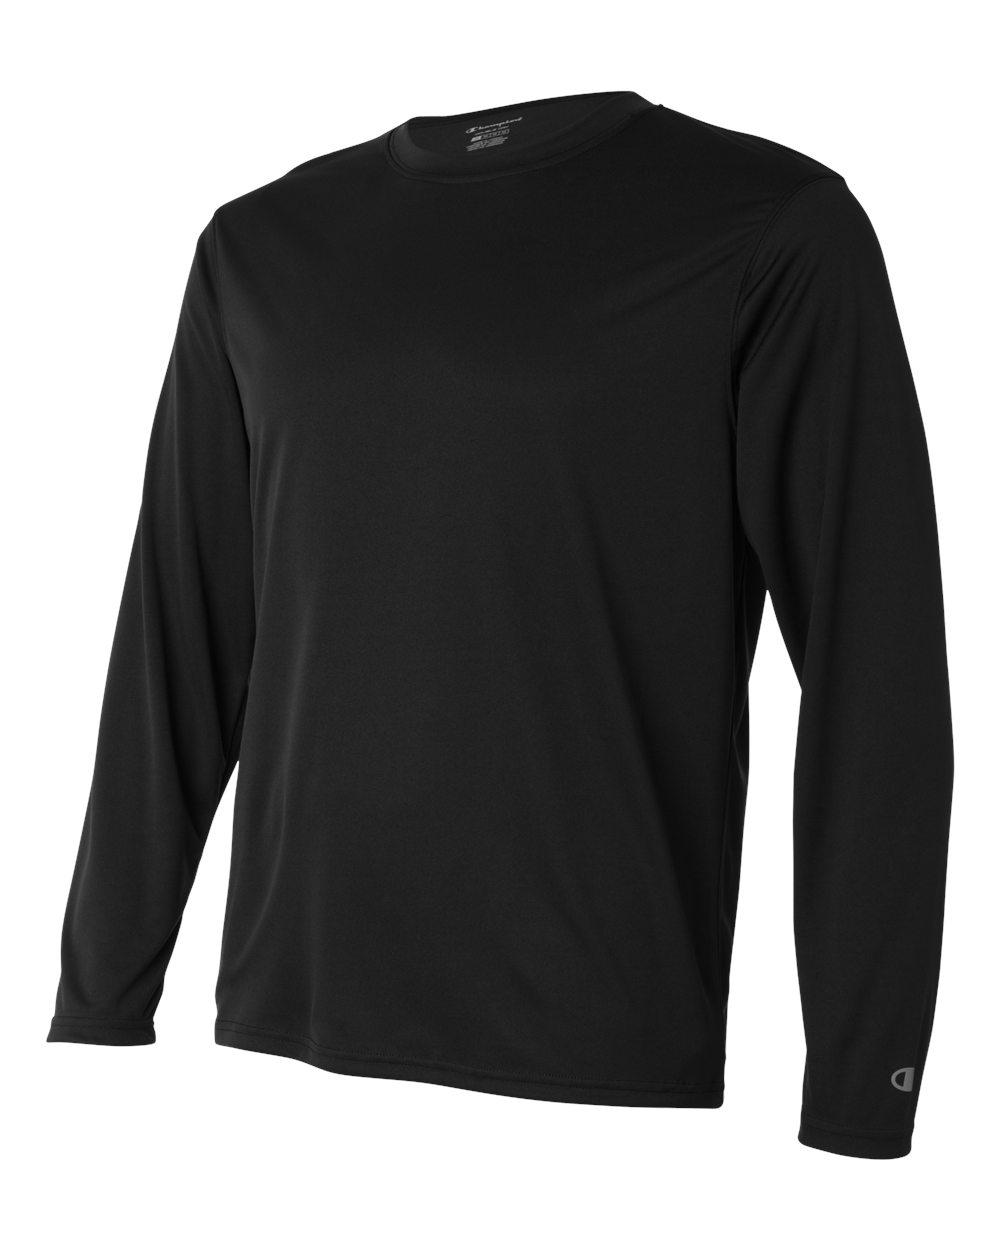 Champion-Men-039-s-Double-Dry-4-1-oz-Long-Sleeve-Interlock-T-Shirt-CW26-XS-3XL thumbnail 4